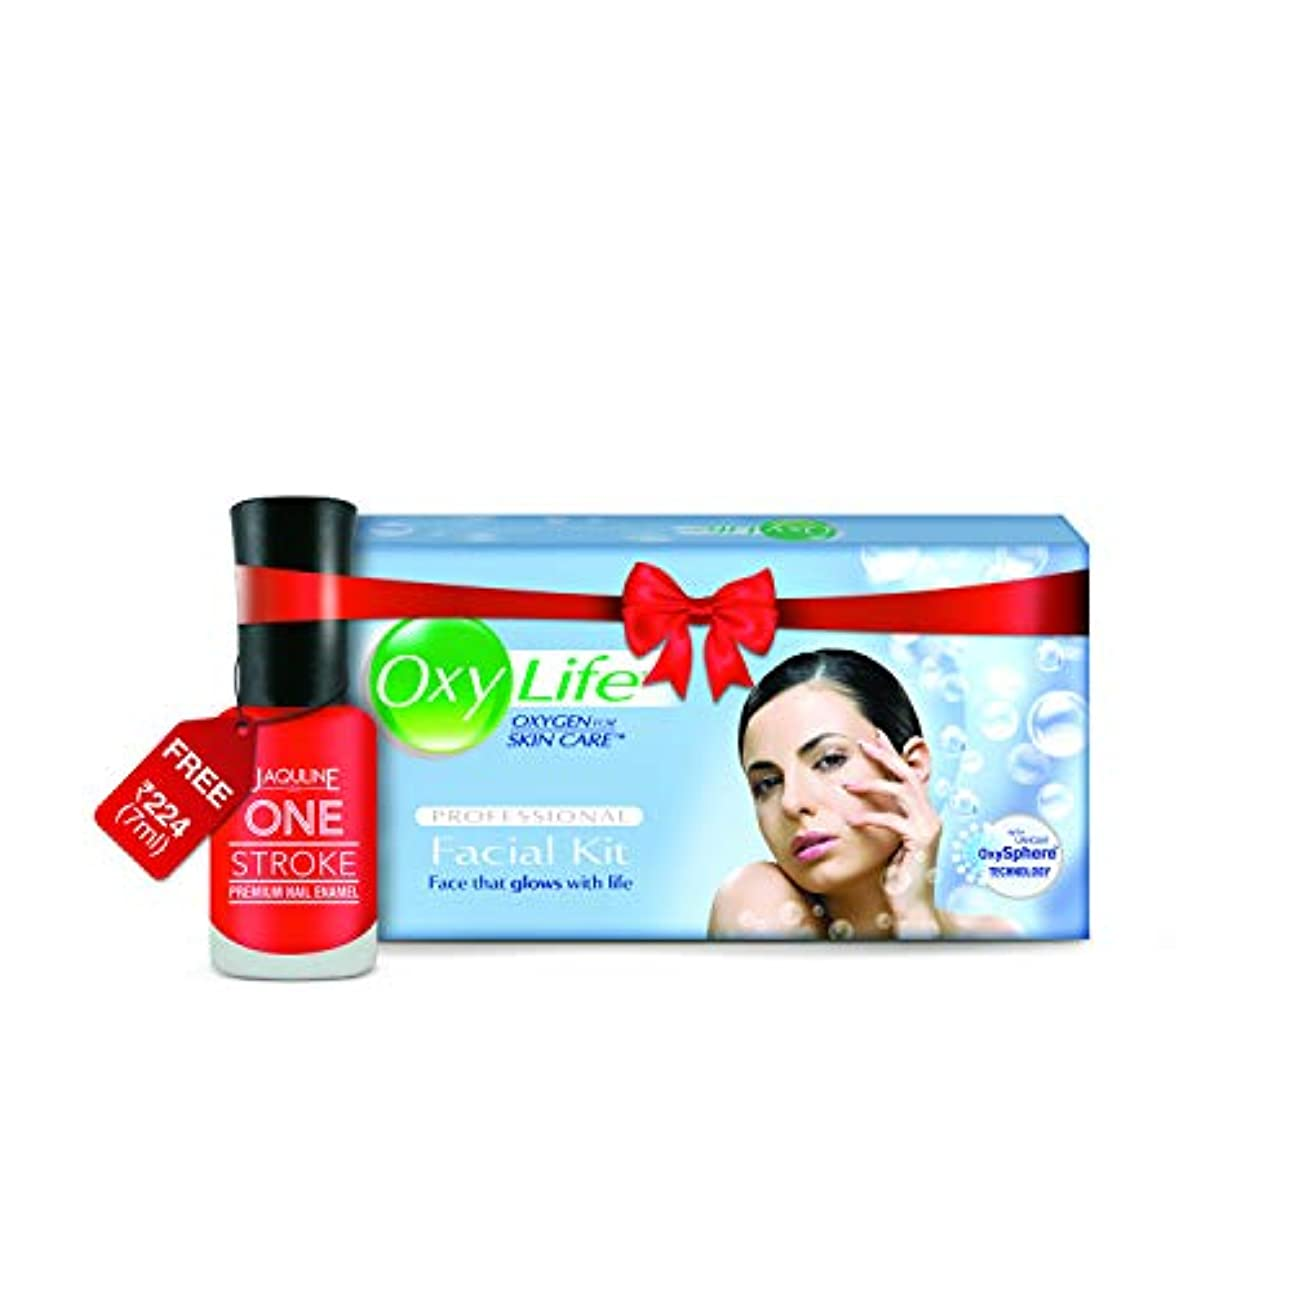 OxylifeプロフェッショナルユニークOxysphereテクノロジーフェイシャルキット - スキンケアのための酸素Oxylife Professional Facial Kit with Unique Oxysphere...